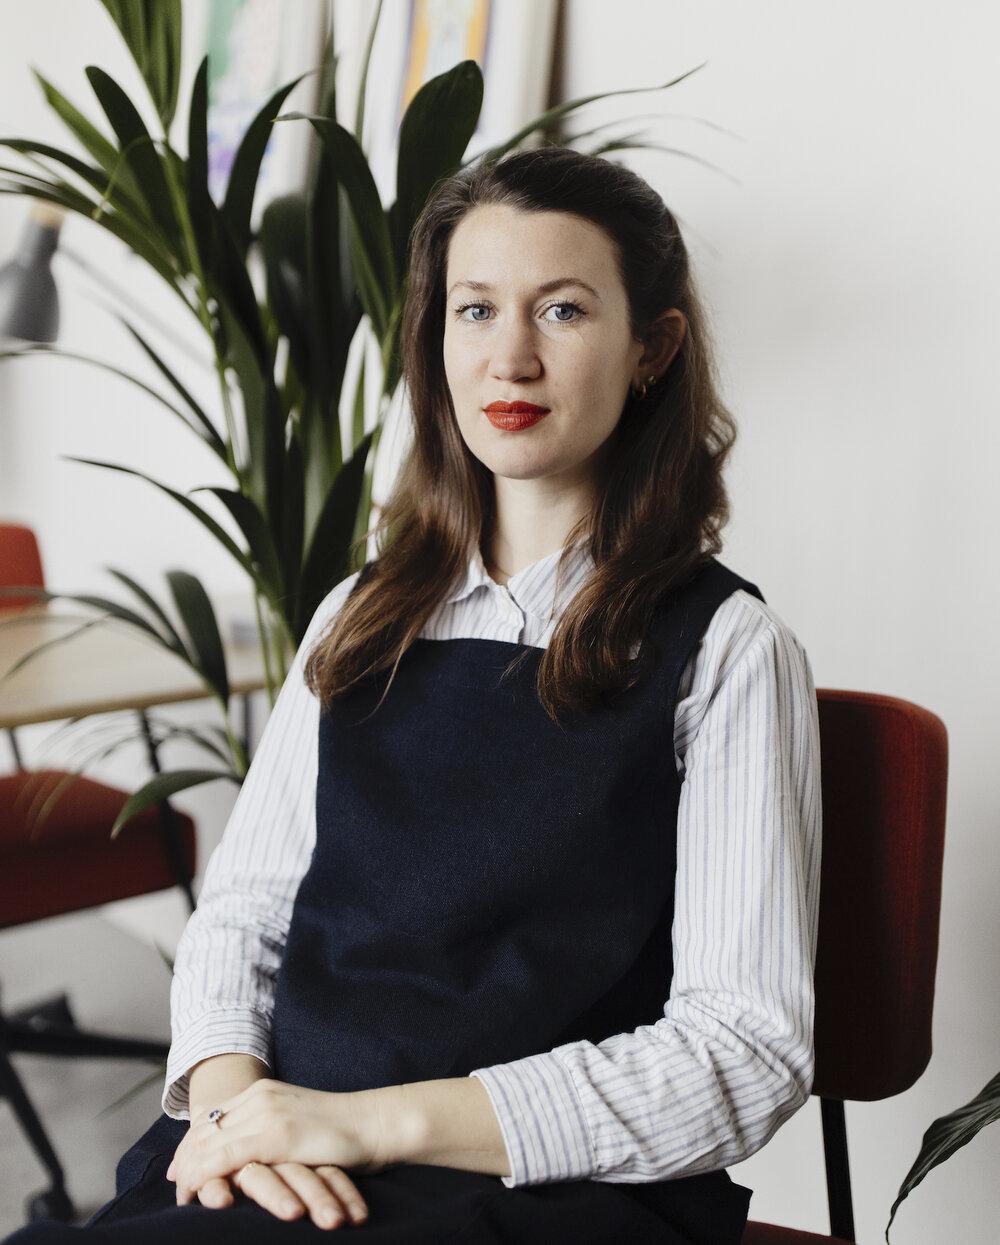 Joanna Payne, by Luke Fullalove